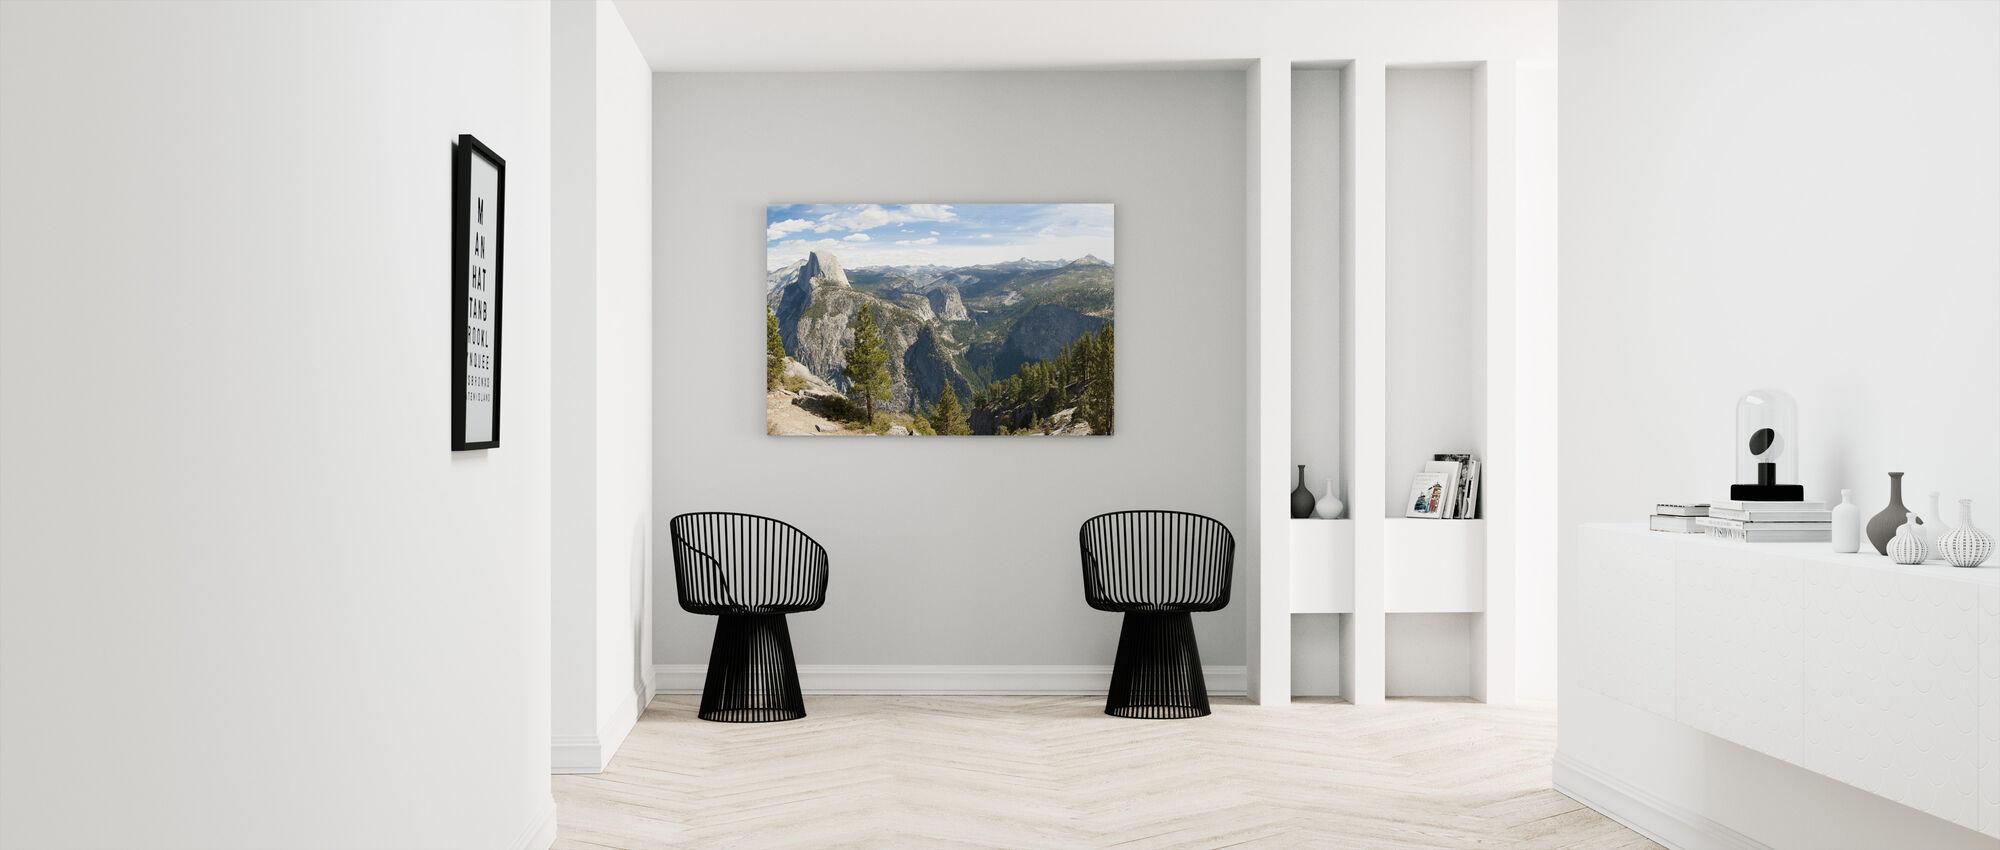 Yosemite park, California - Canvas print - Hallway